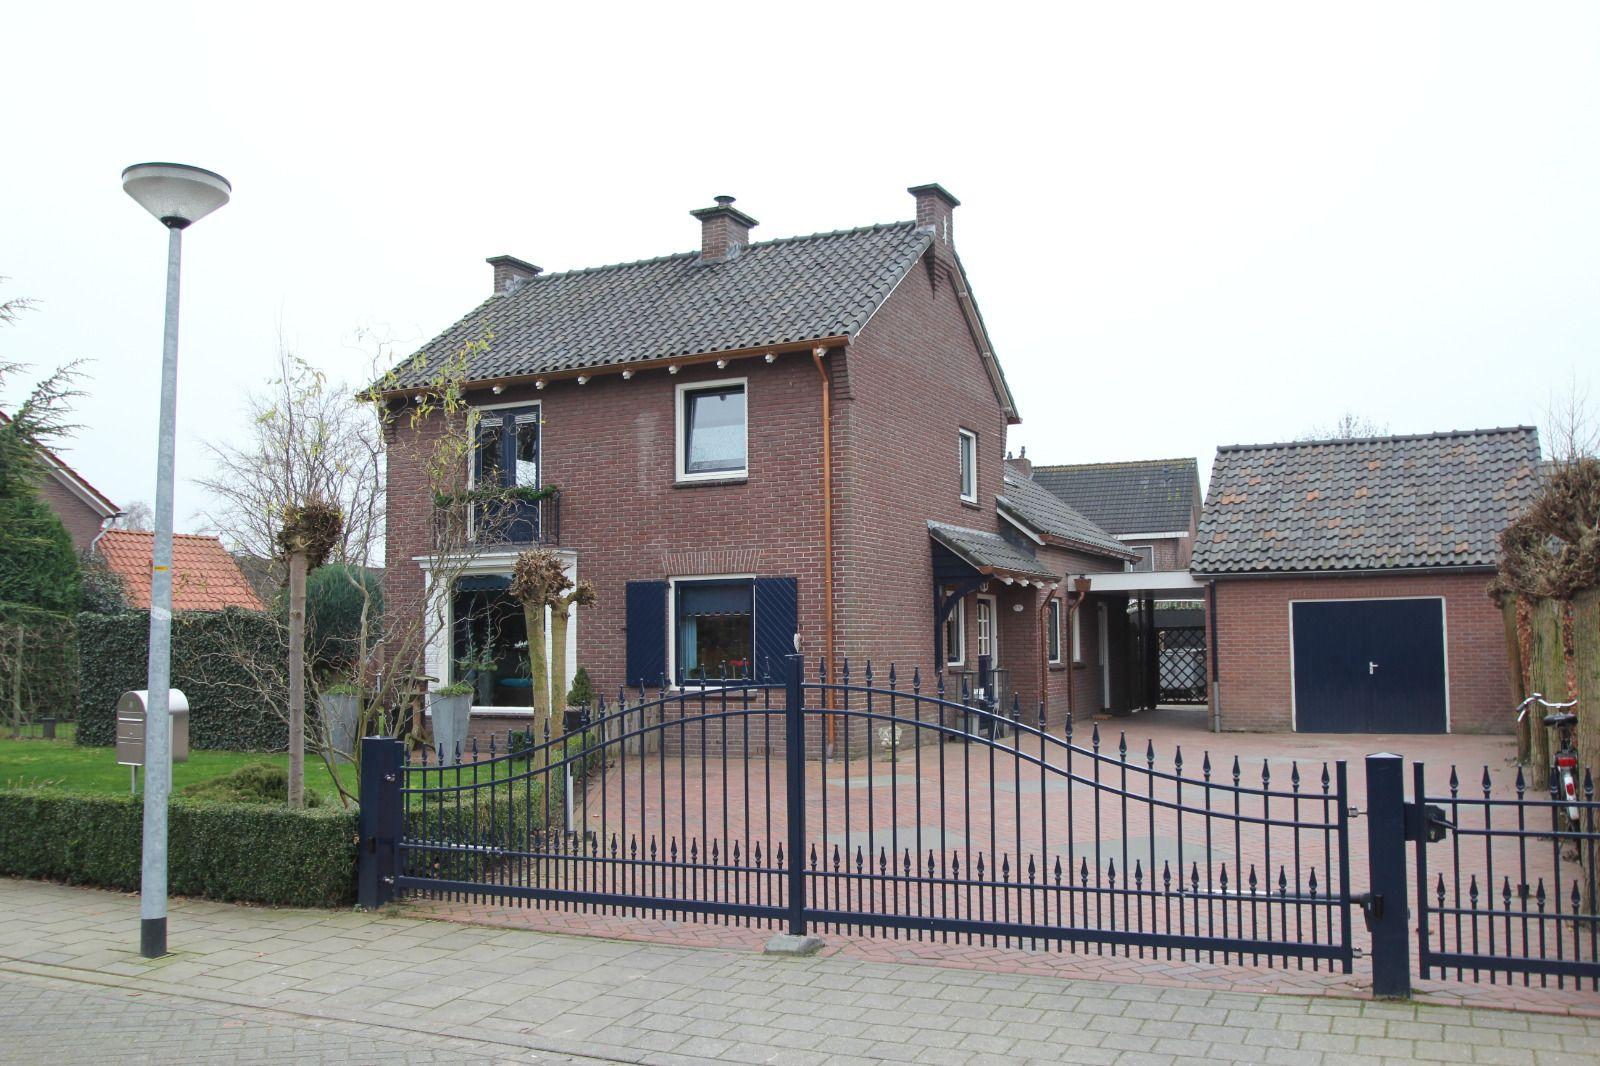 Ursulastraat 19, Harreveld